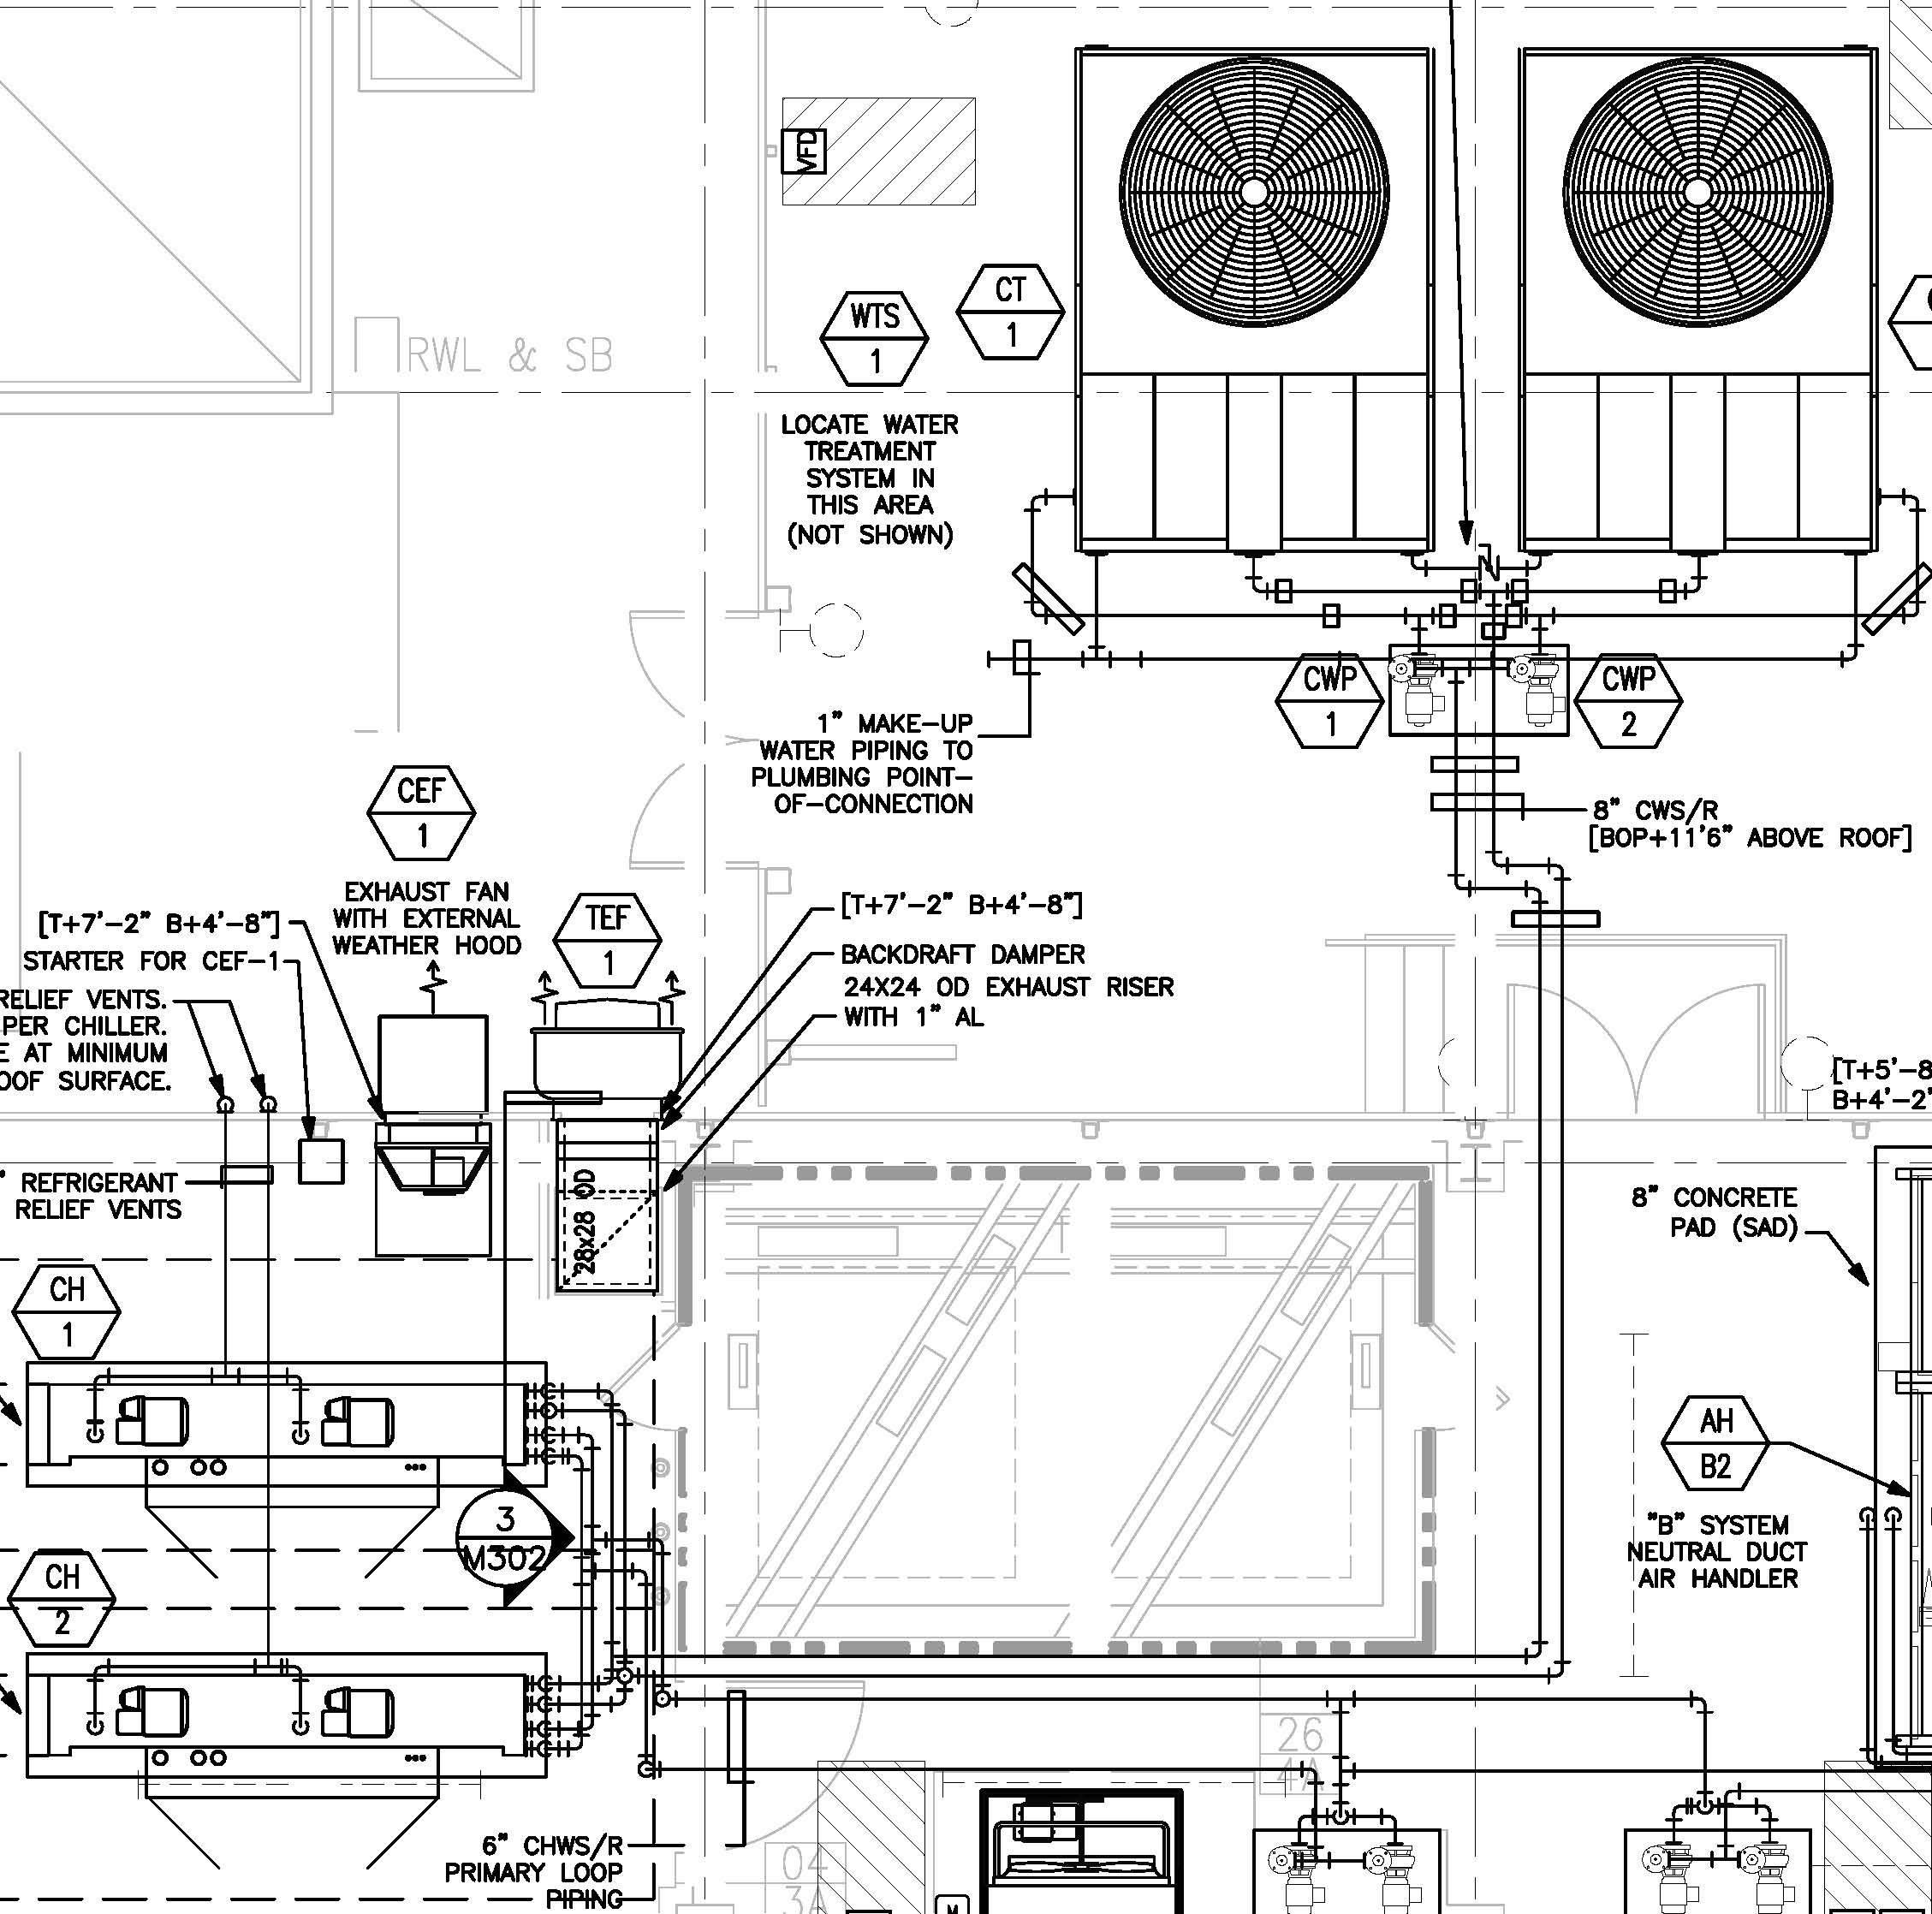 condensing unit wiring diagram Download-Hvac Condenser Wiring Diagram New Air Conditioning Condensing Unit Wiring Diagram Valid Wiring Diagram 8-s